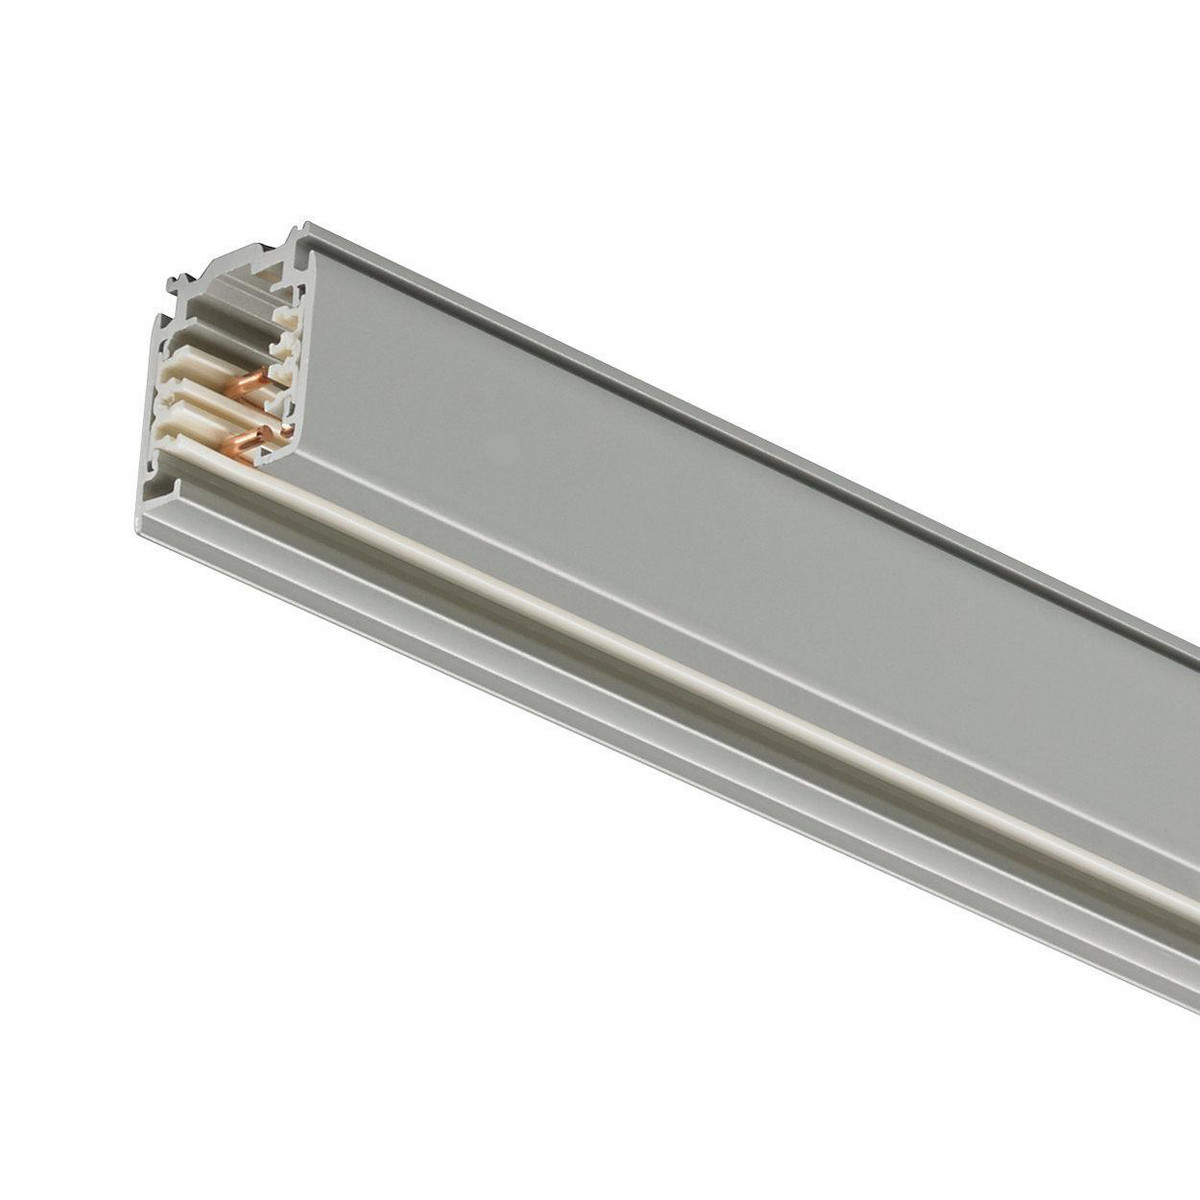 GLOBAL XTSC6300-1 Strømskinne DALI 3M Alu